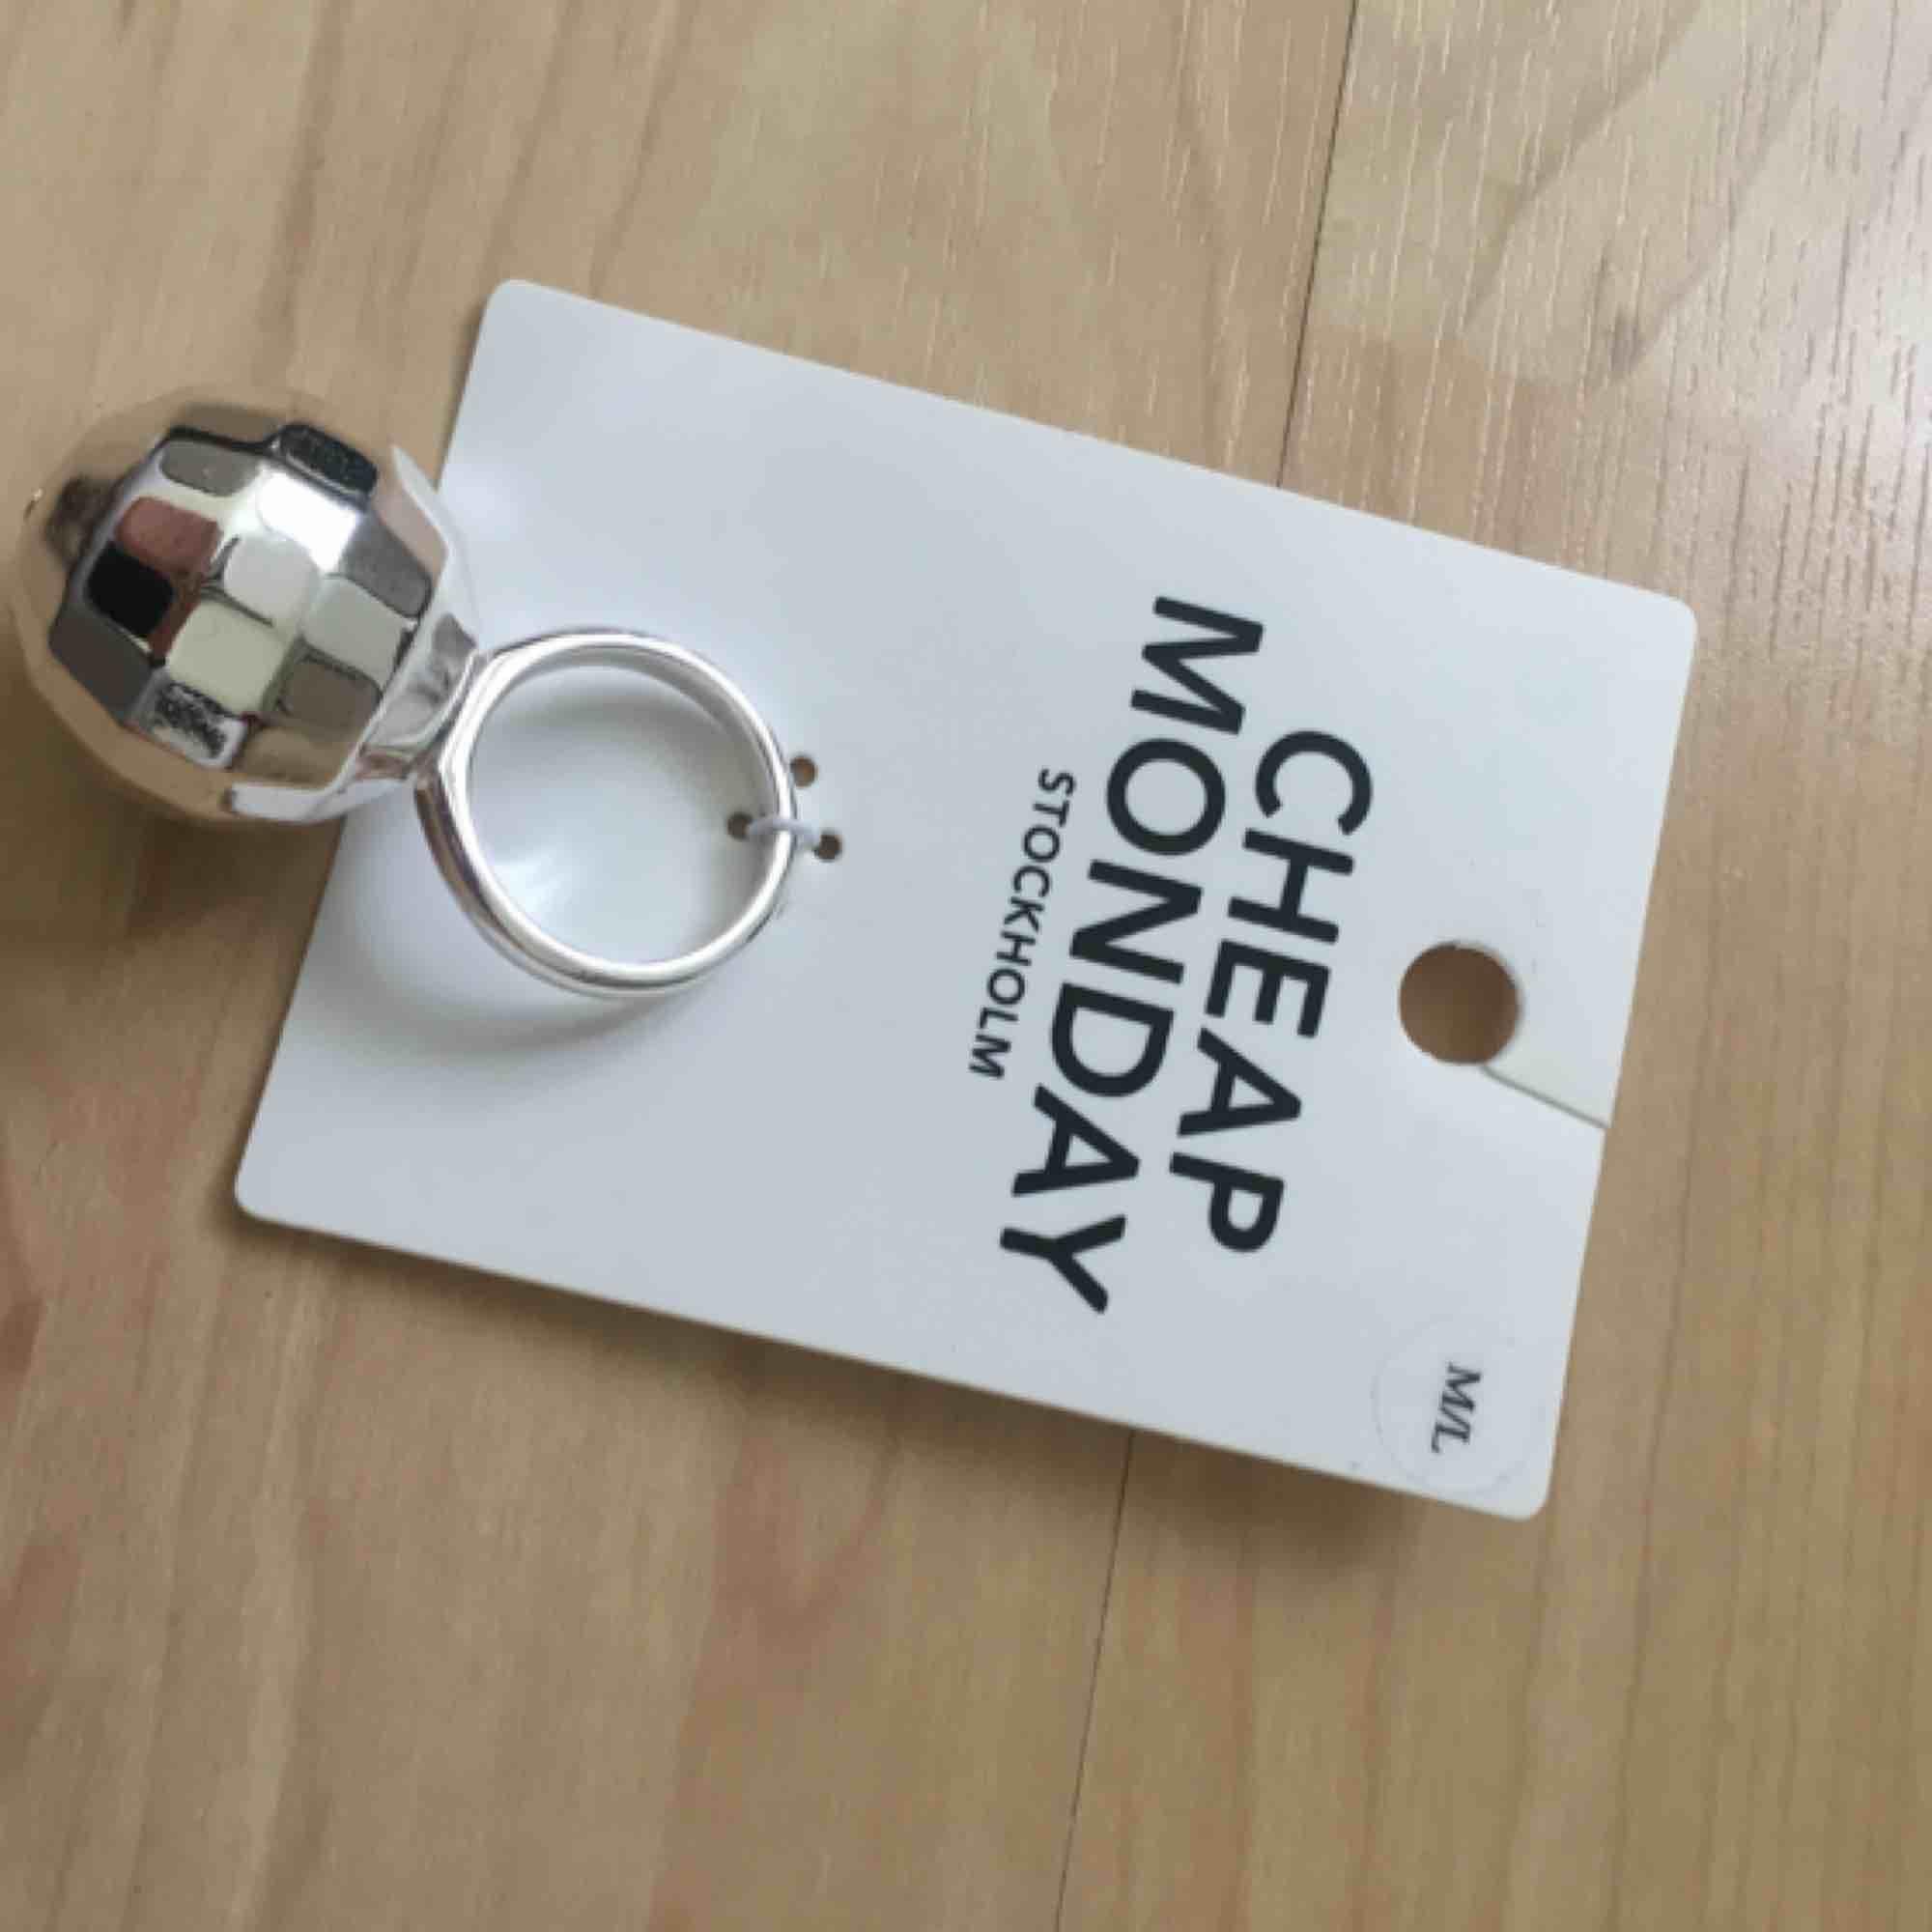 Helt ny ring i strl M/L❤️. Accessoarer.